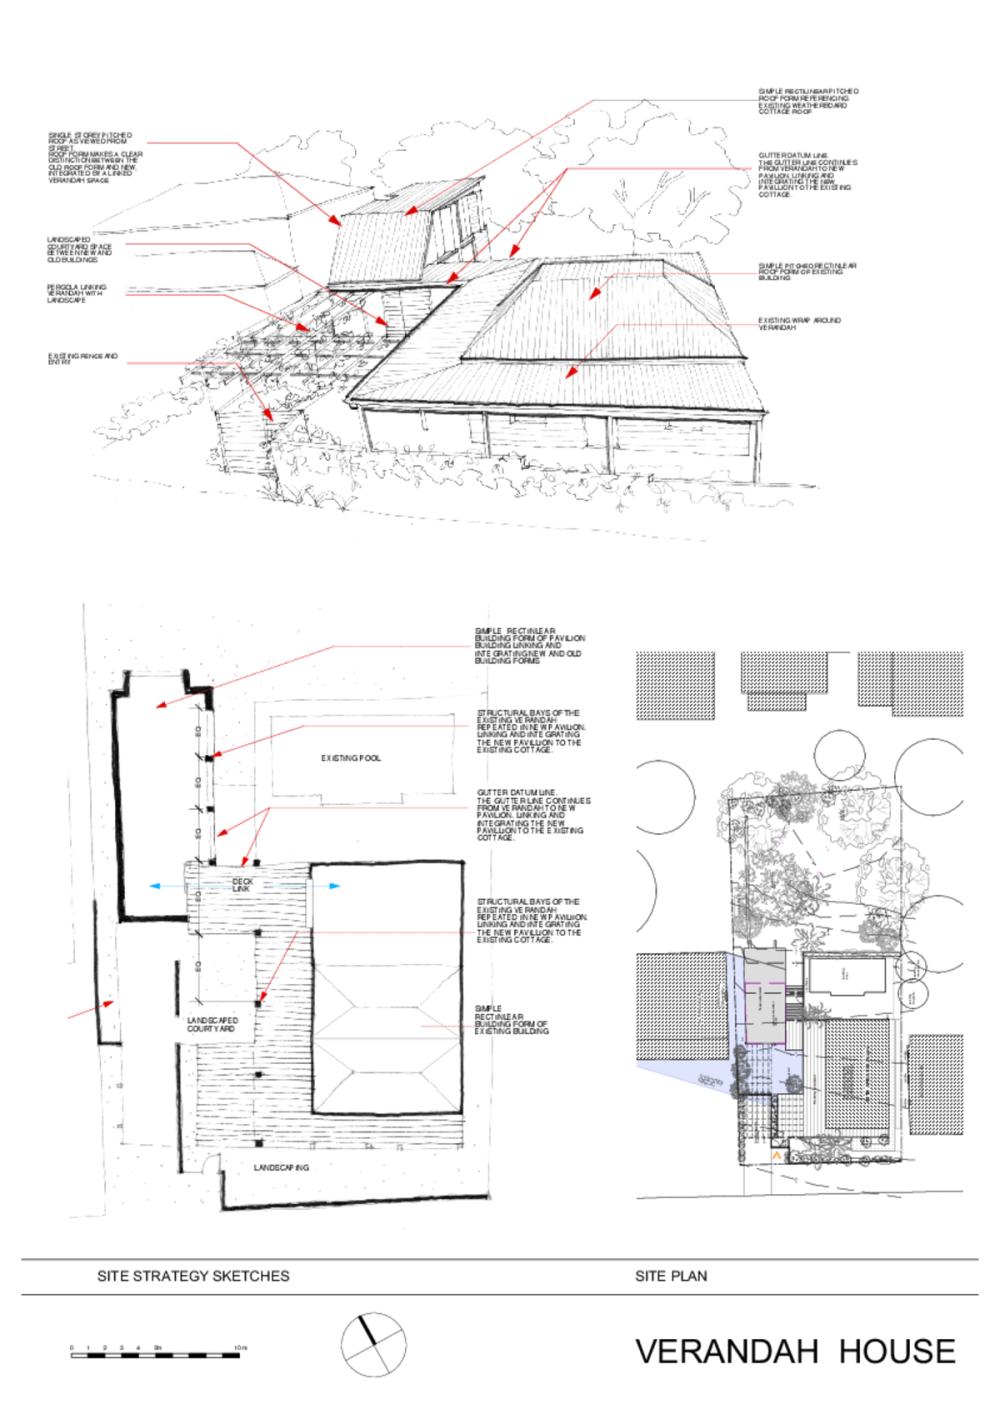 medium resolution of gallery of verandah house by still space architecture local australia residential bespoke design putney sydney